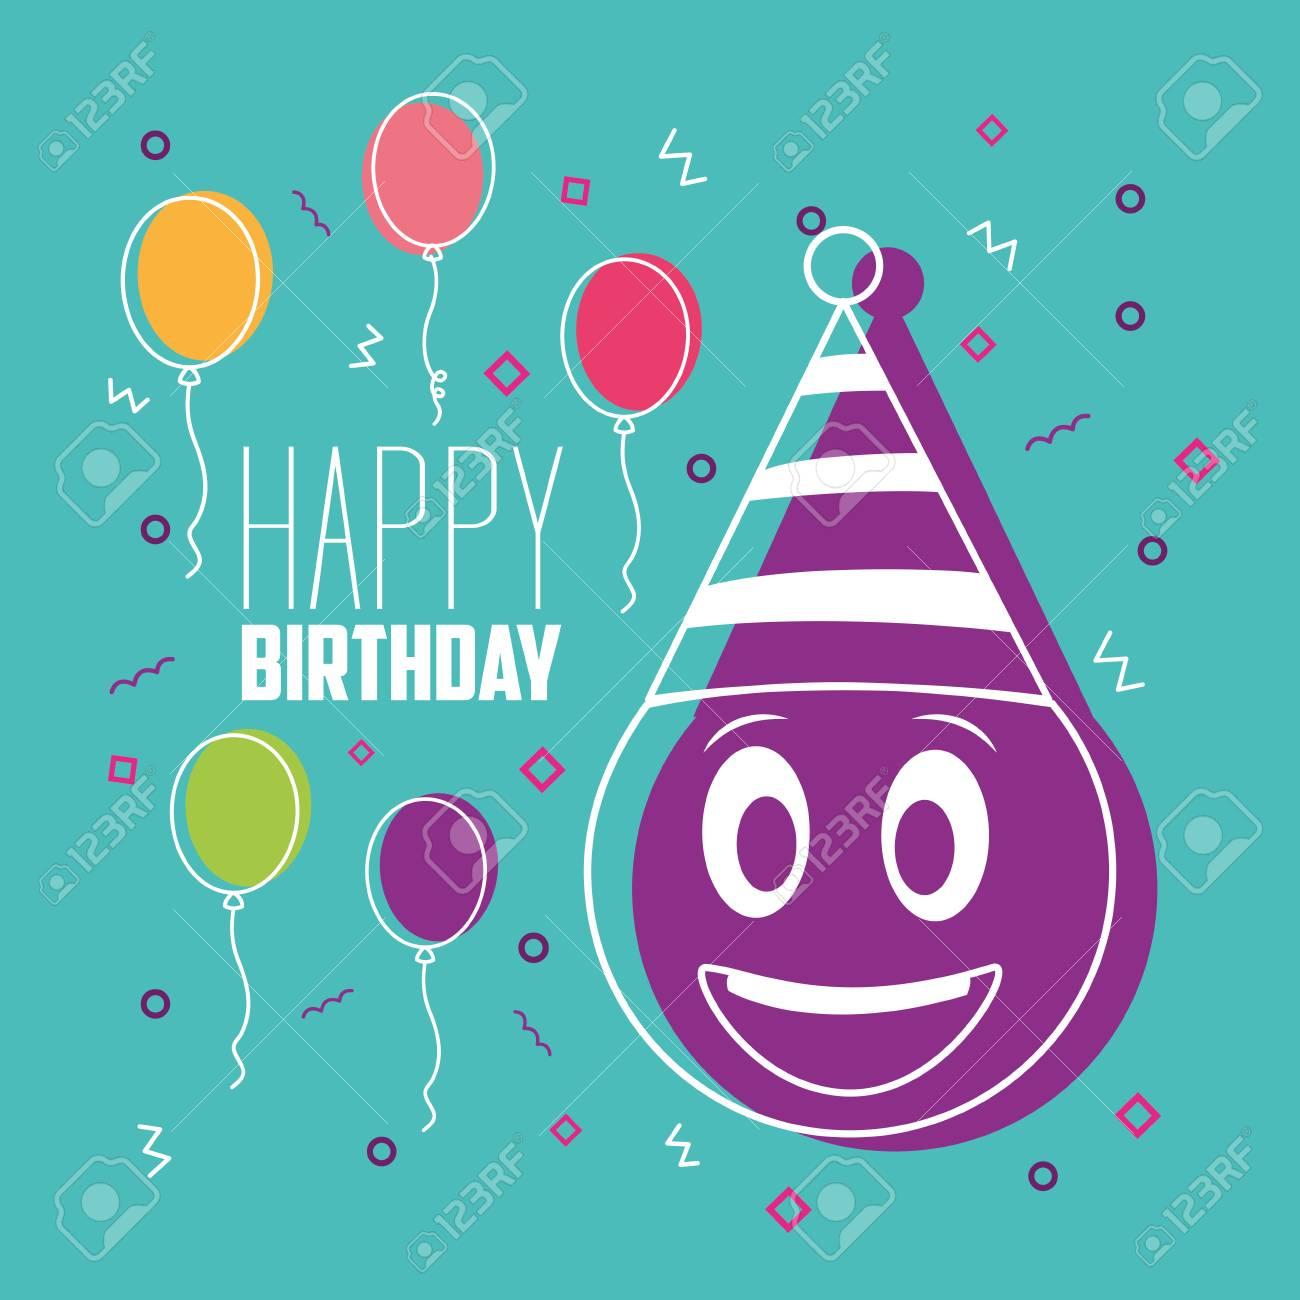 Happy Birthday Smiling Emoji Party Hat Balloons Colors Celebration Vector Illustration Stock